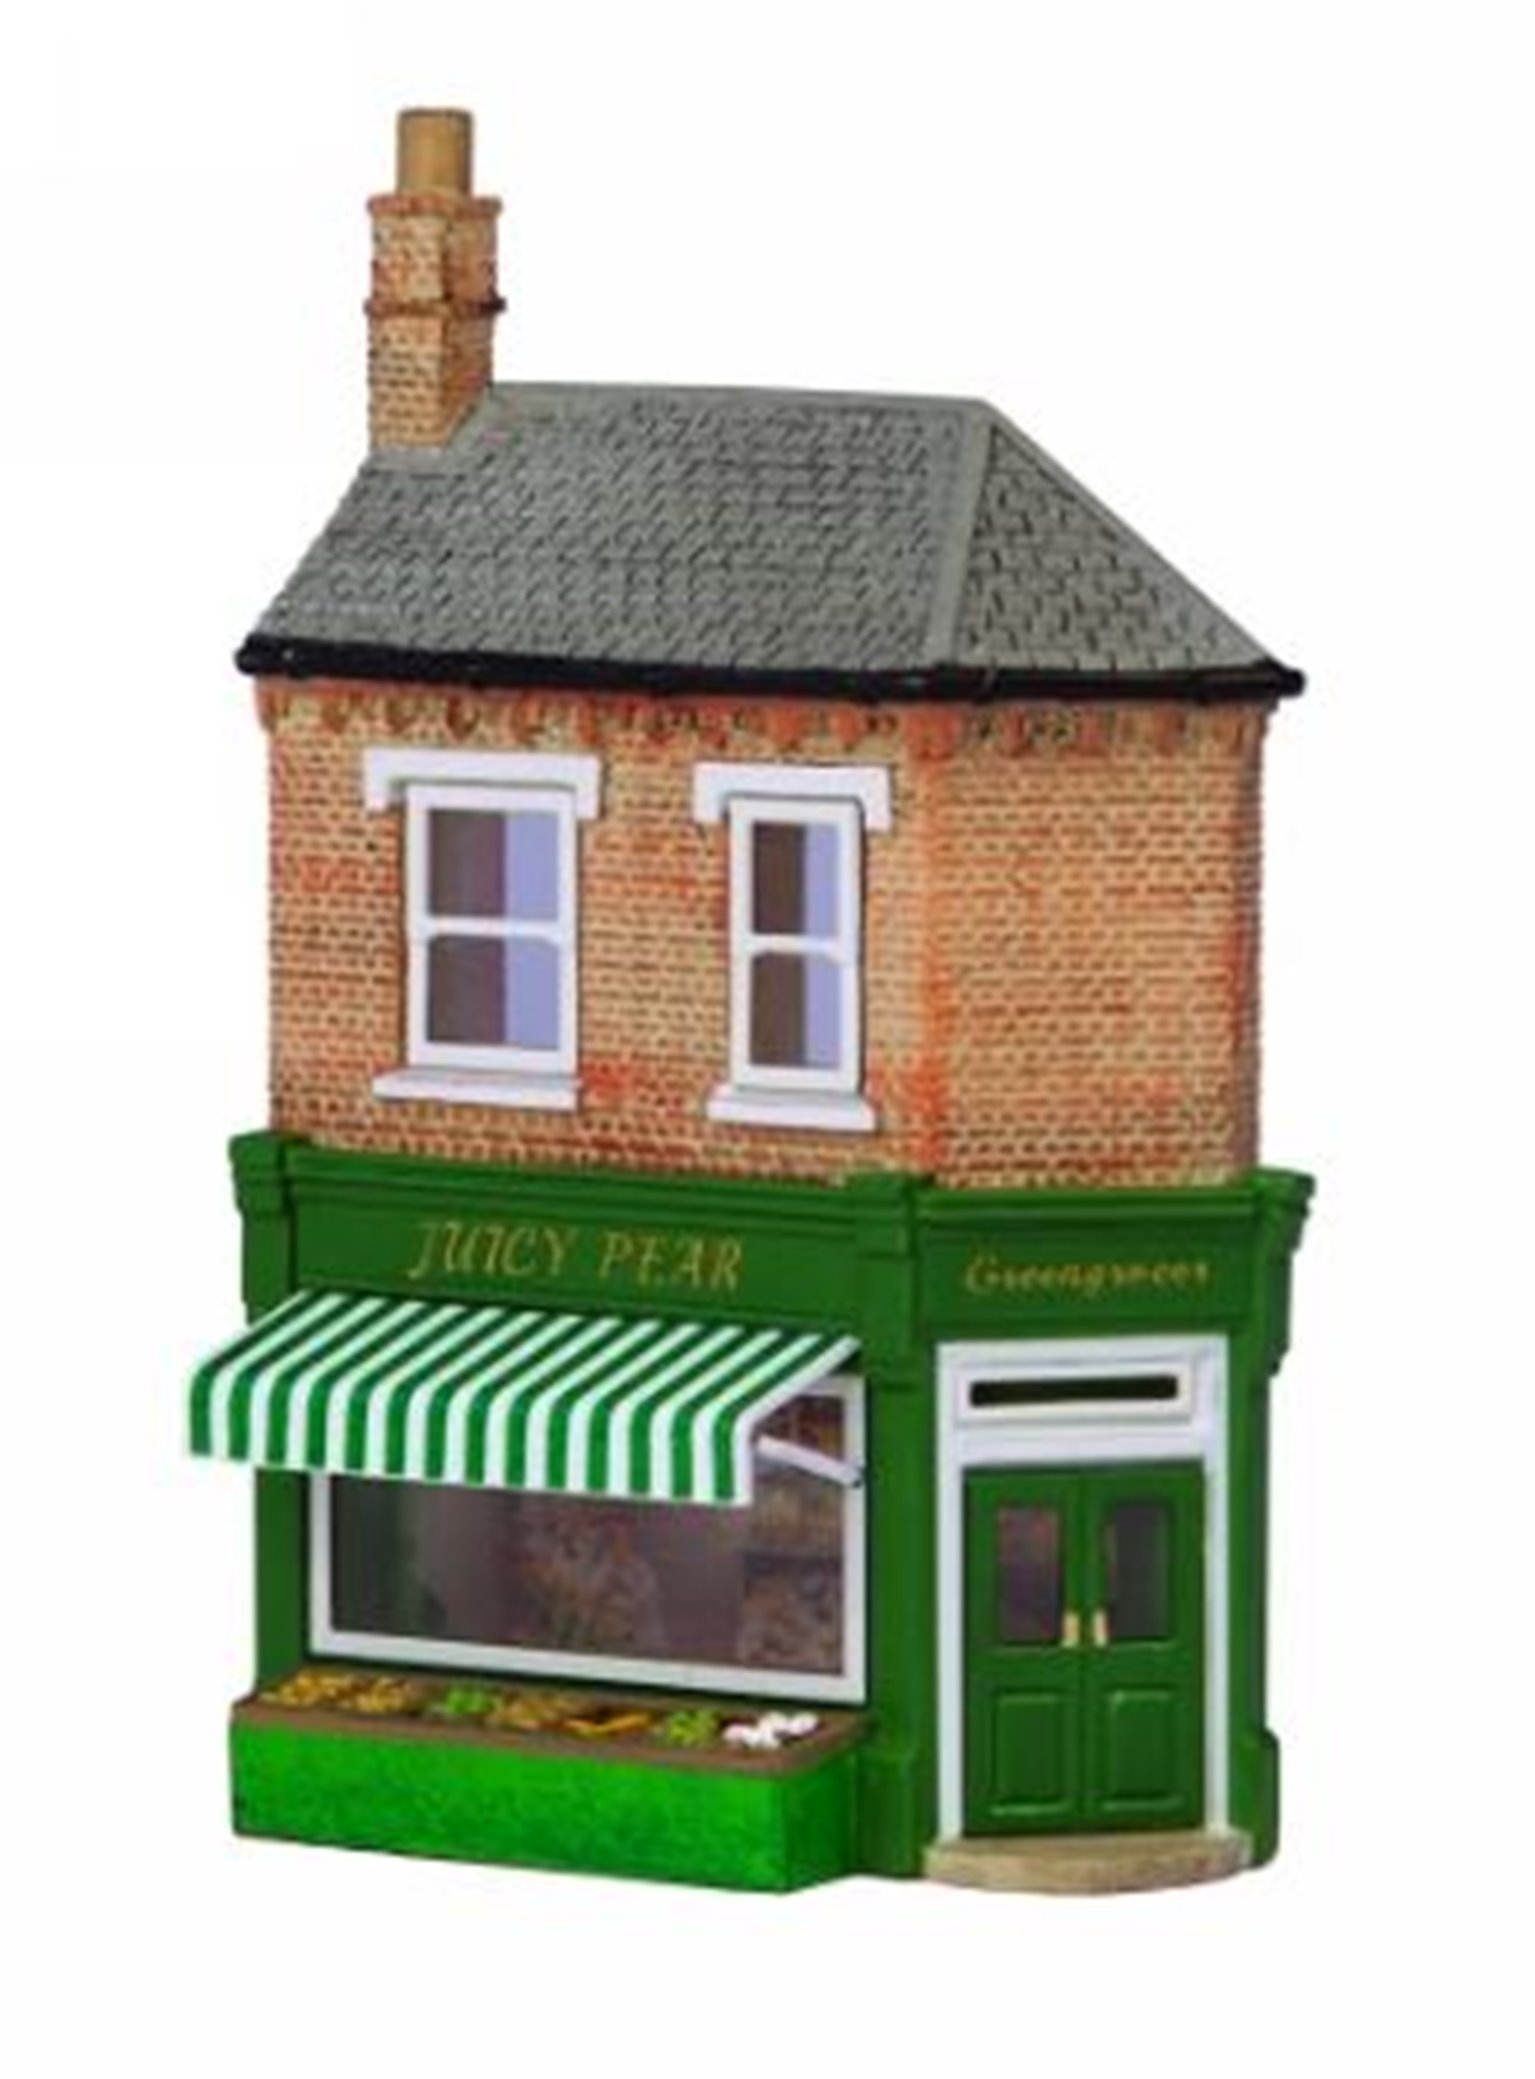 Low Relief Greengrocers